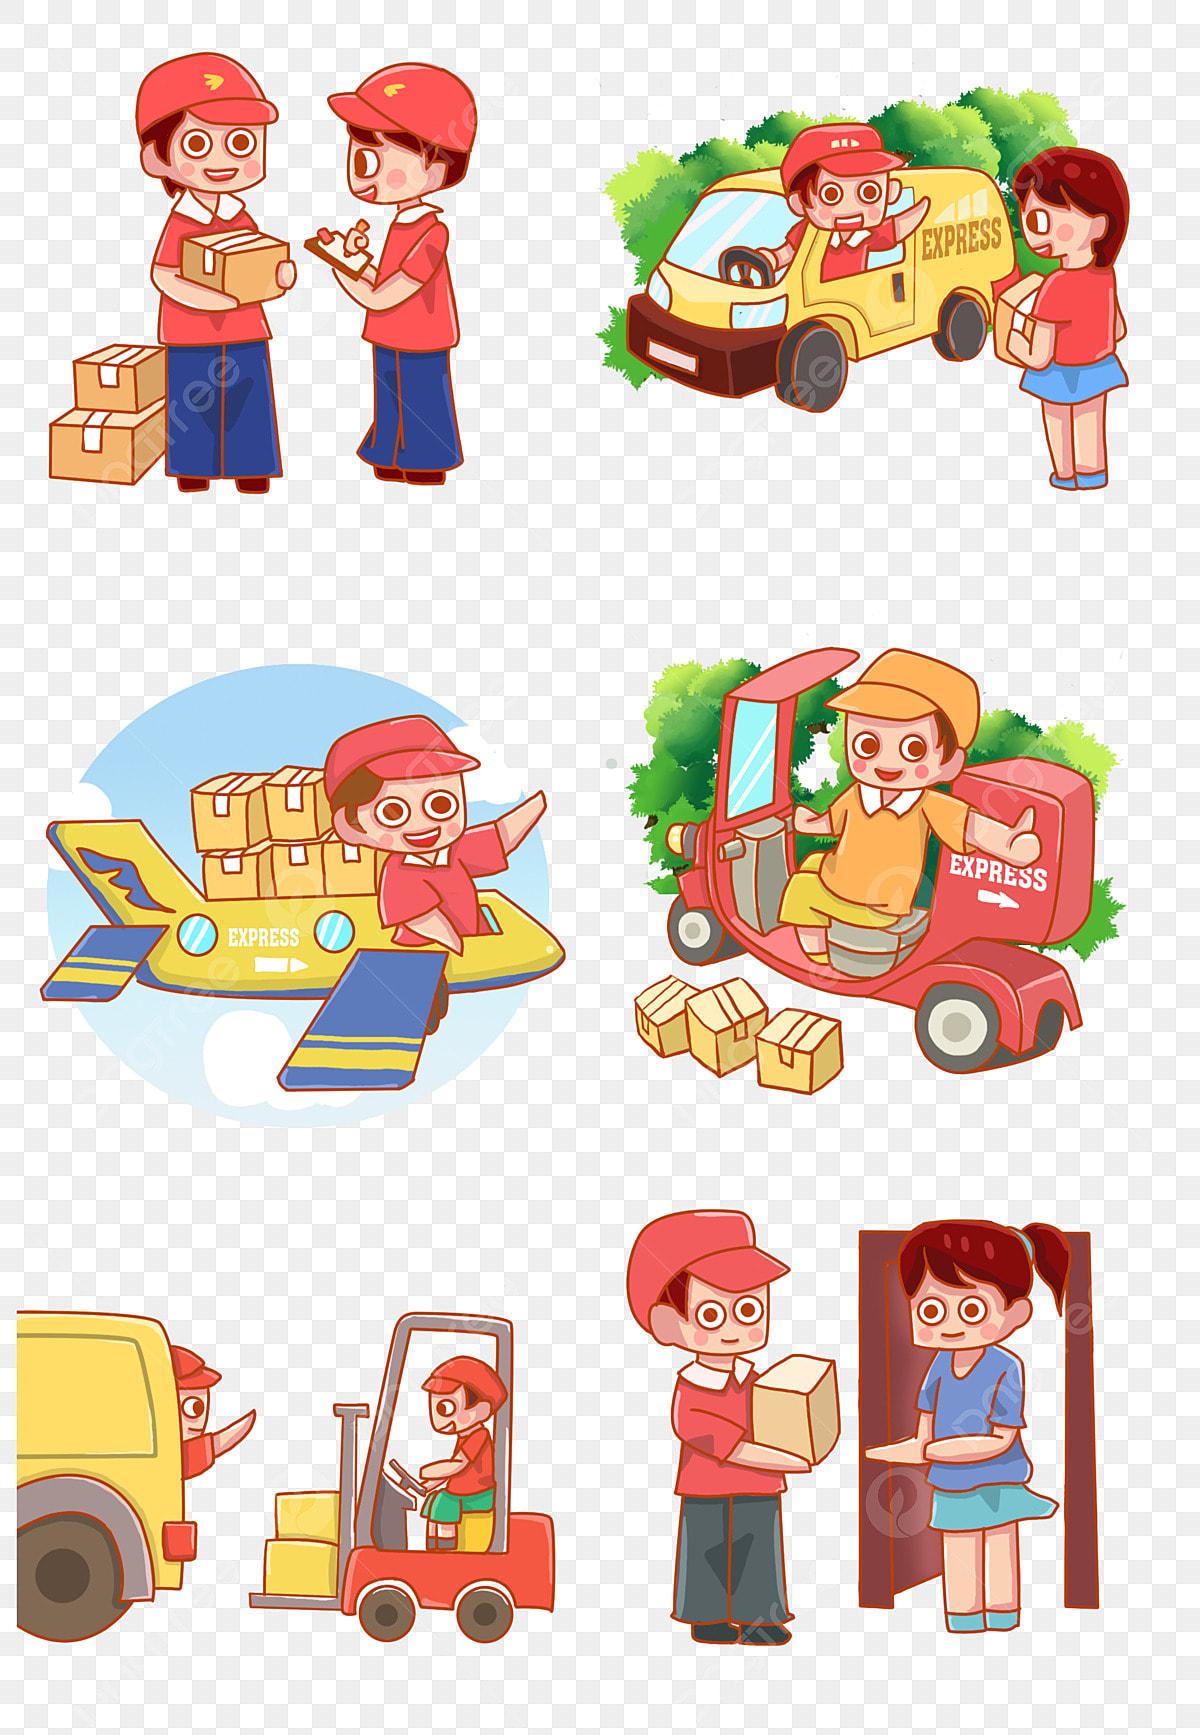 Receiving Express Send Delivery Express Car Rickshaw, Motorcycle